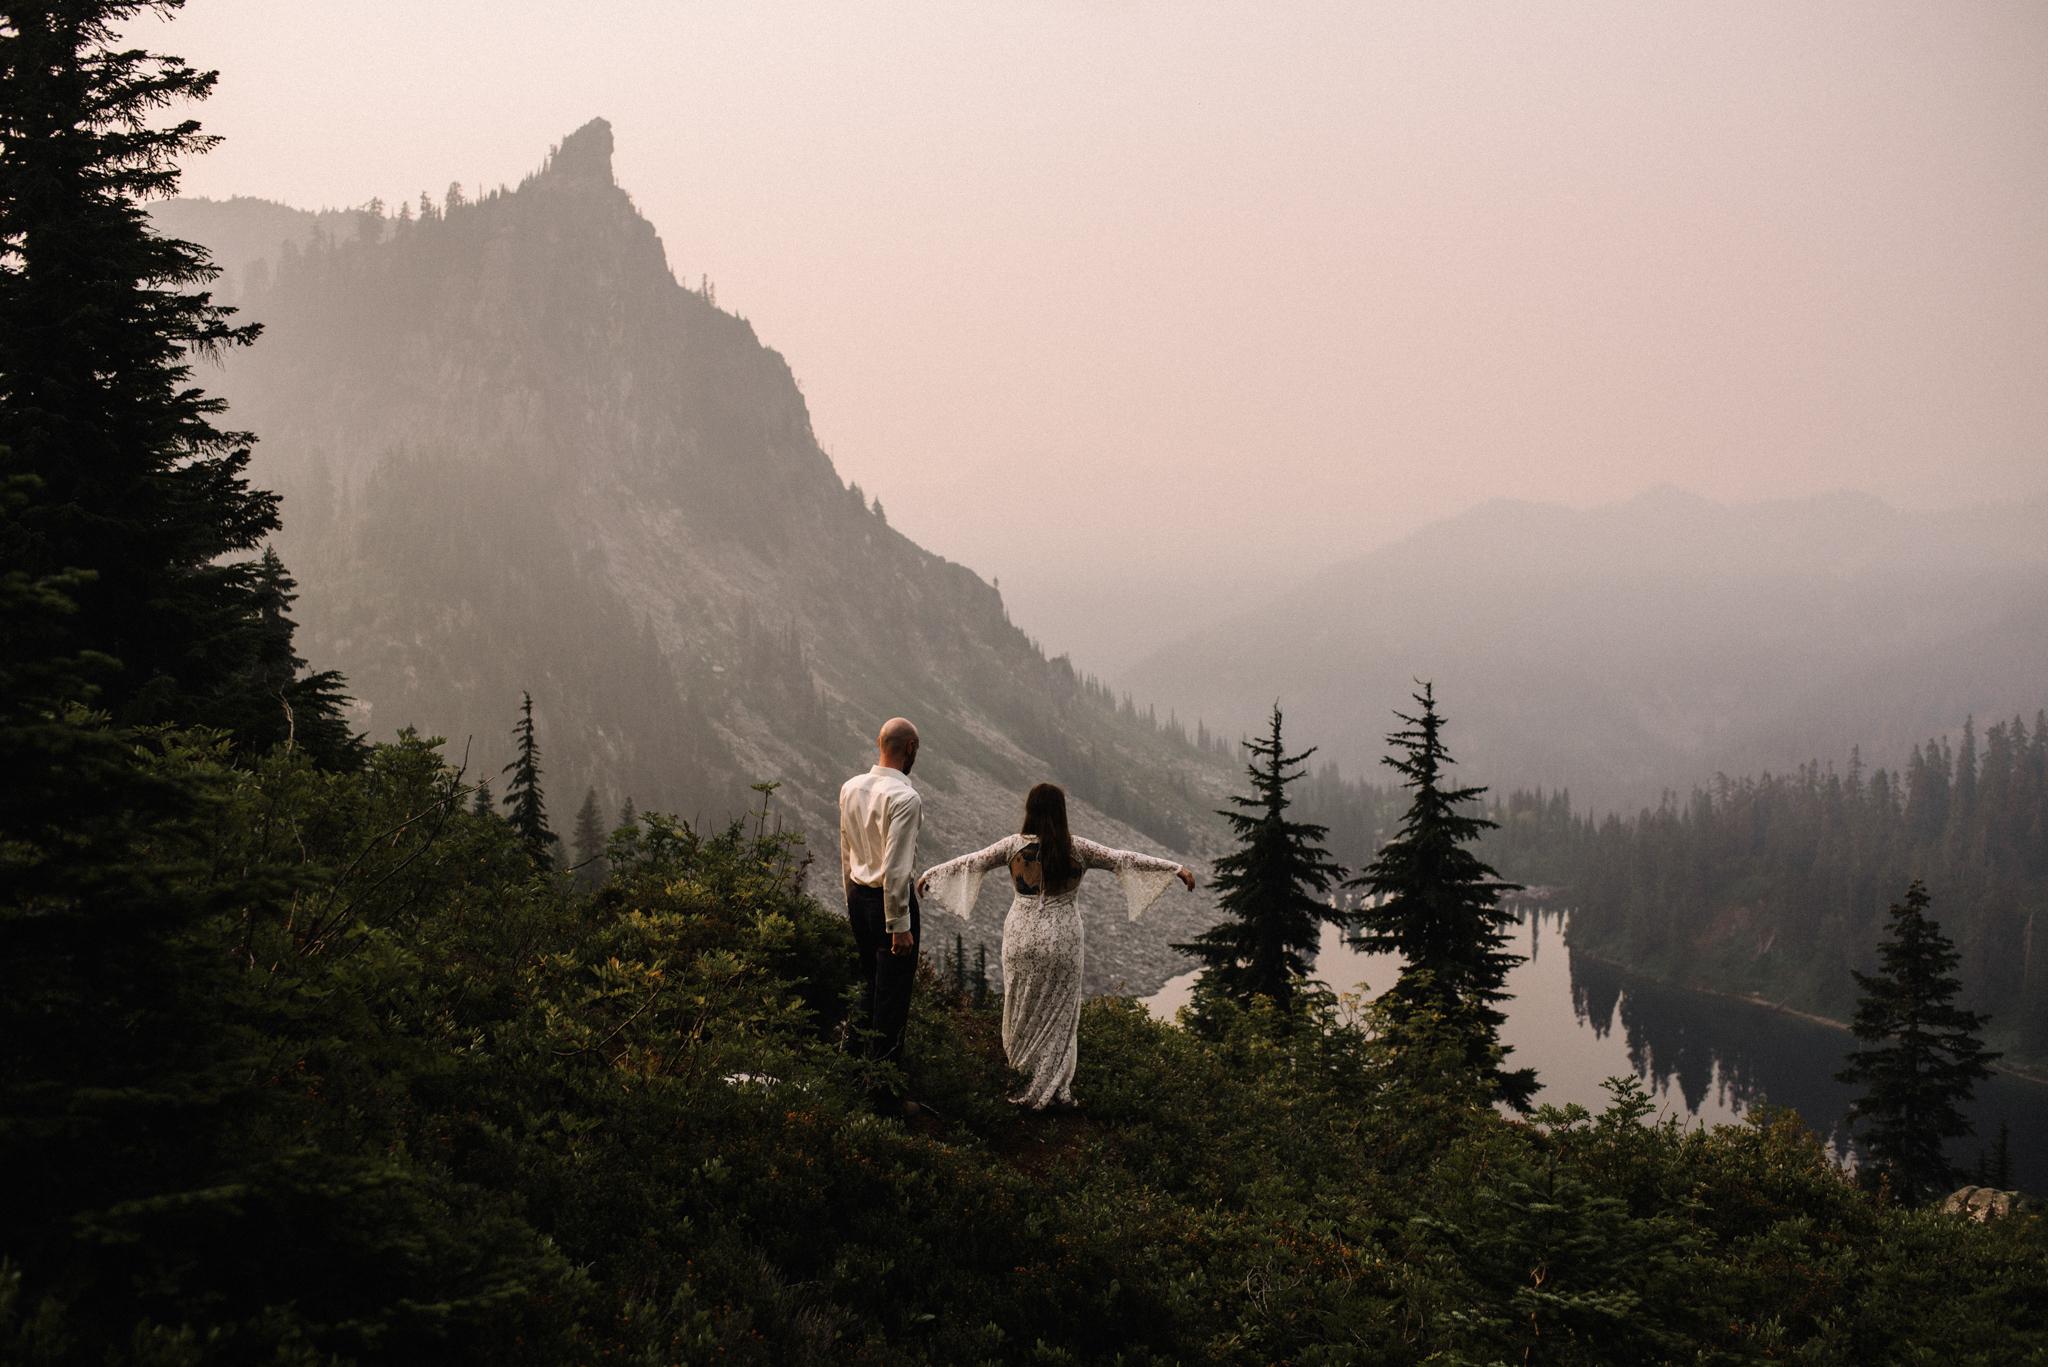 Megan and Andrew Lake Valhalla Washington PNW Adventure Elopement White Sails Creative Sunrise Hike_110.JPG